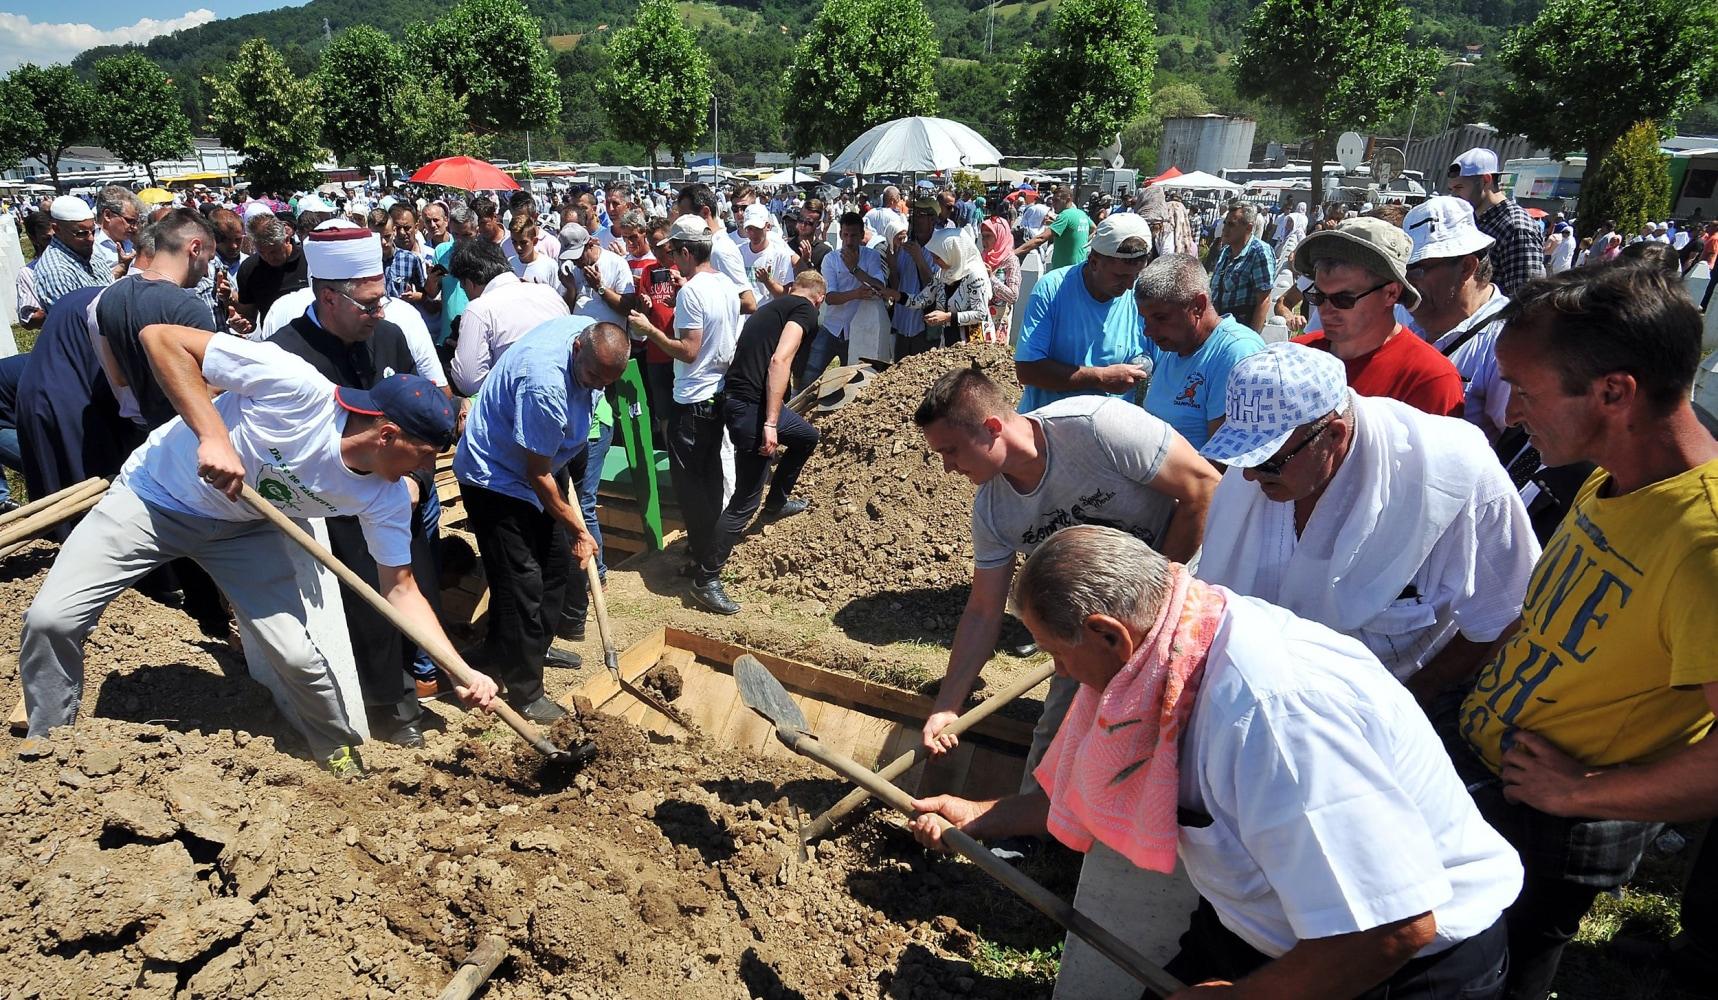 Image: Bosnian Muslims, survivors of Srebrenica 1995 massacre, bury body caskets with remains